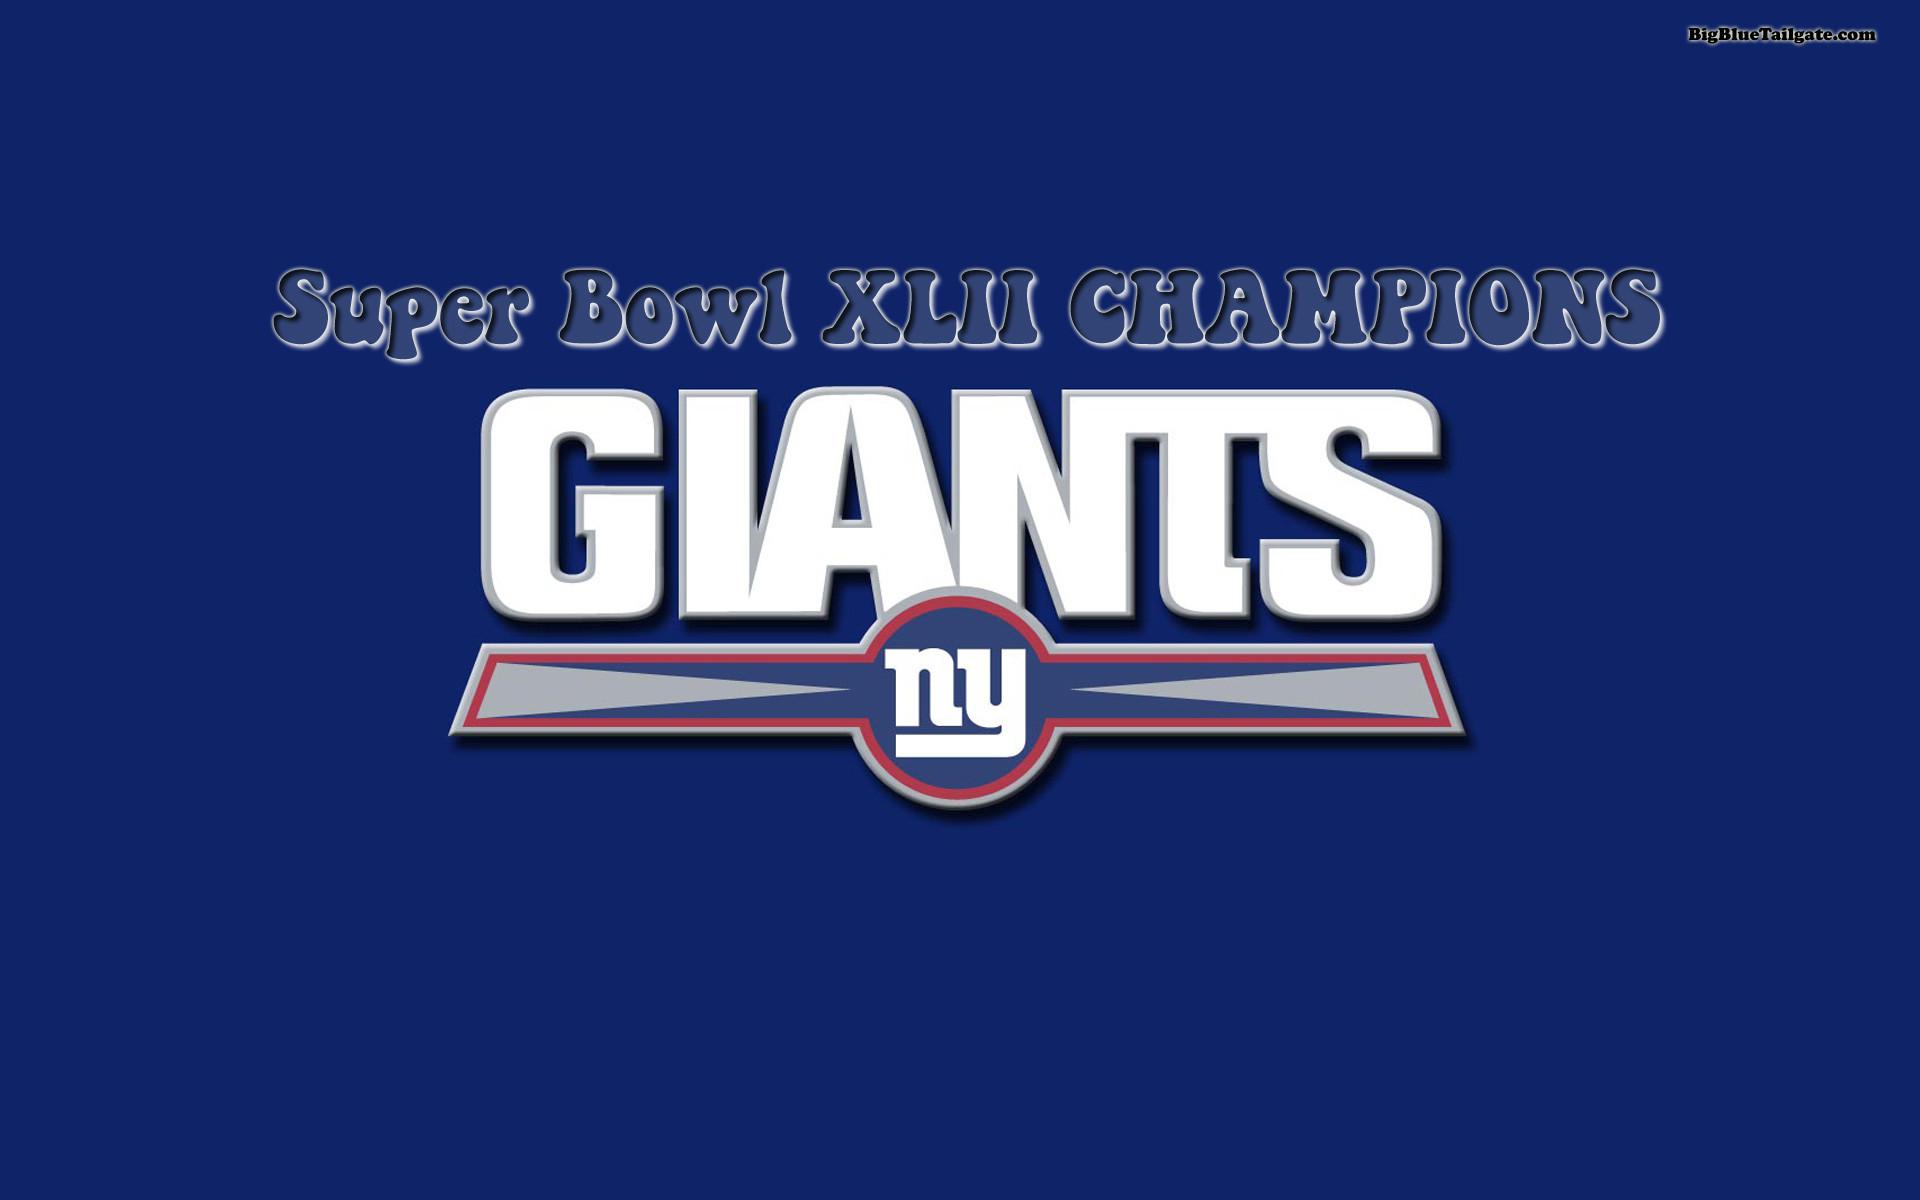 New York Giants wallpaper HD background | New York Giants wallpapers